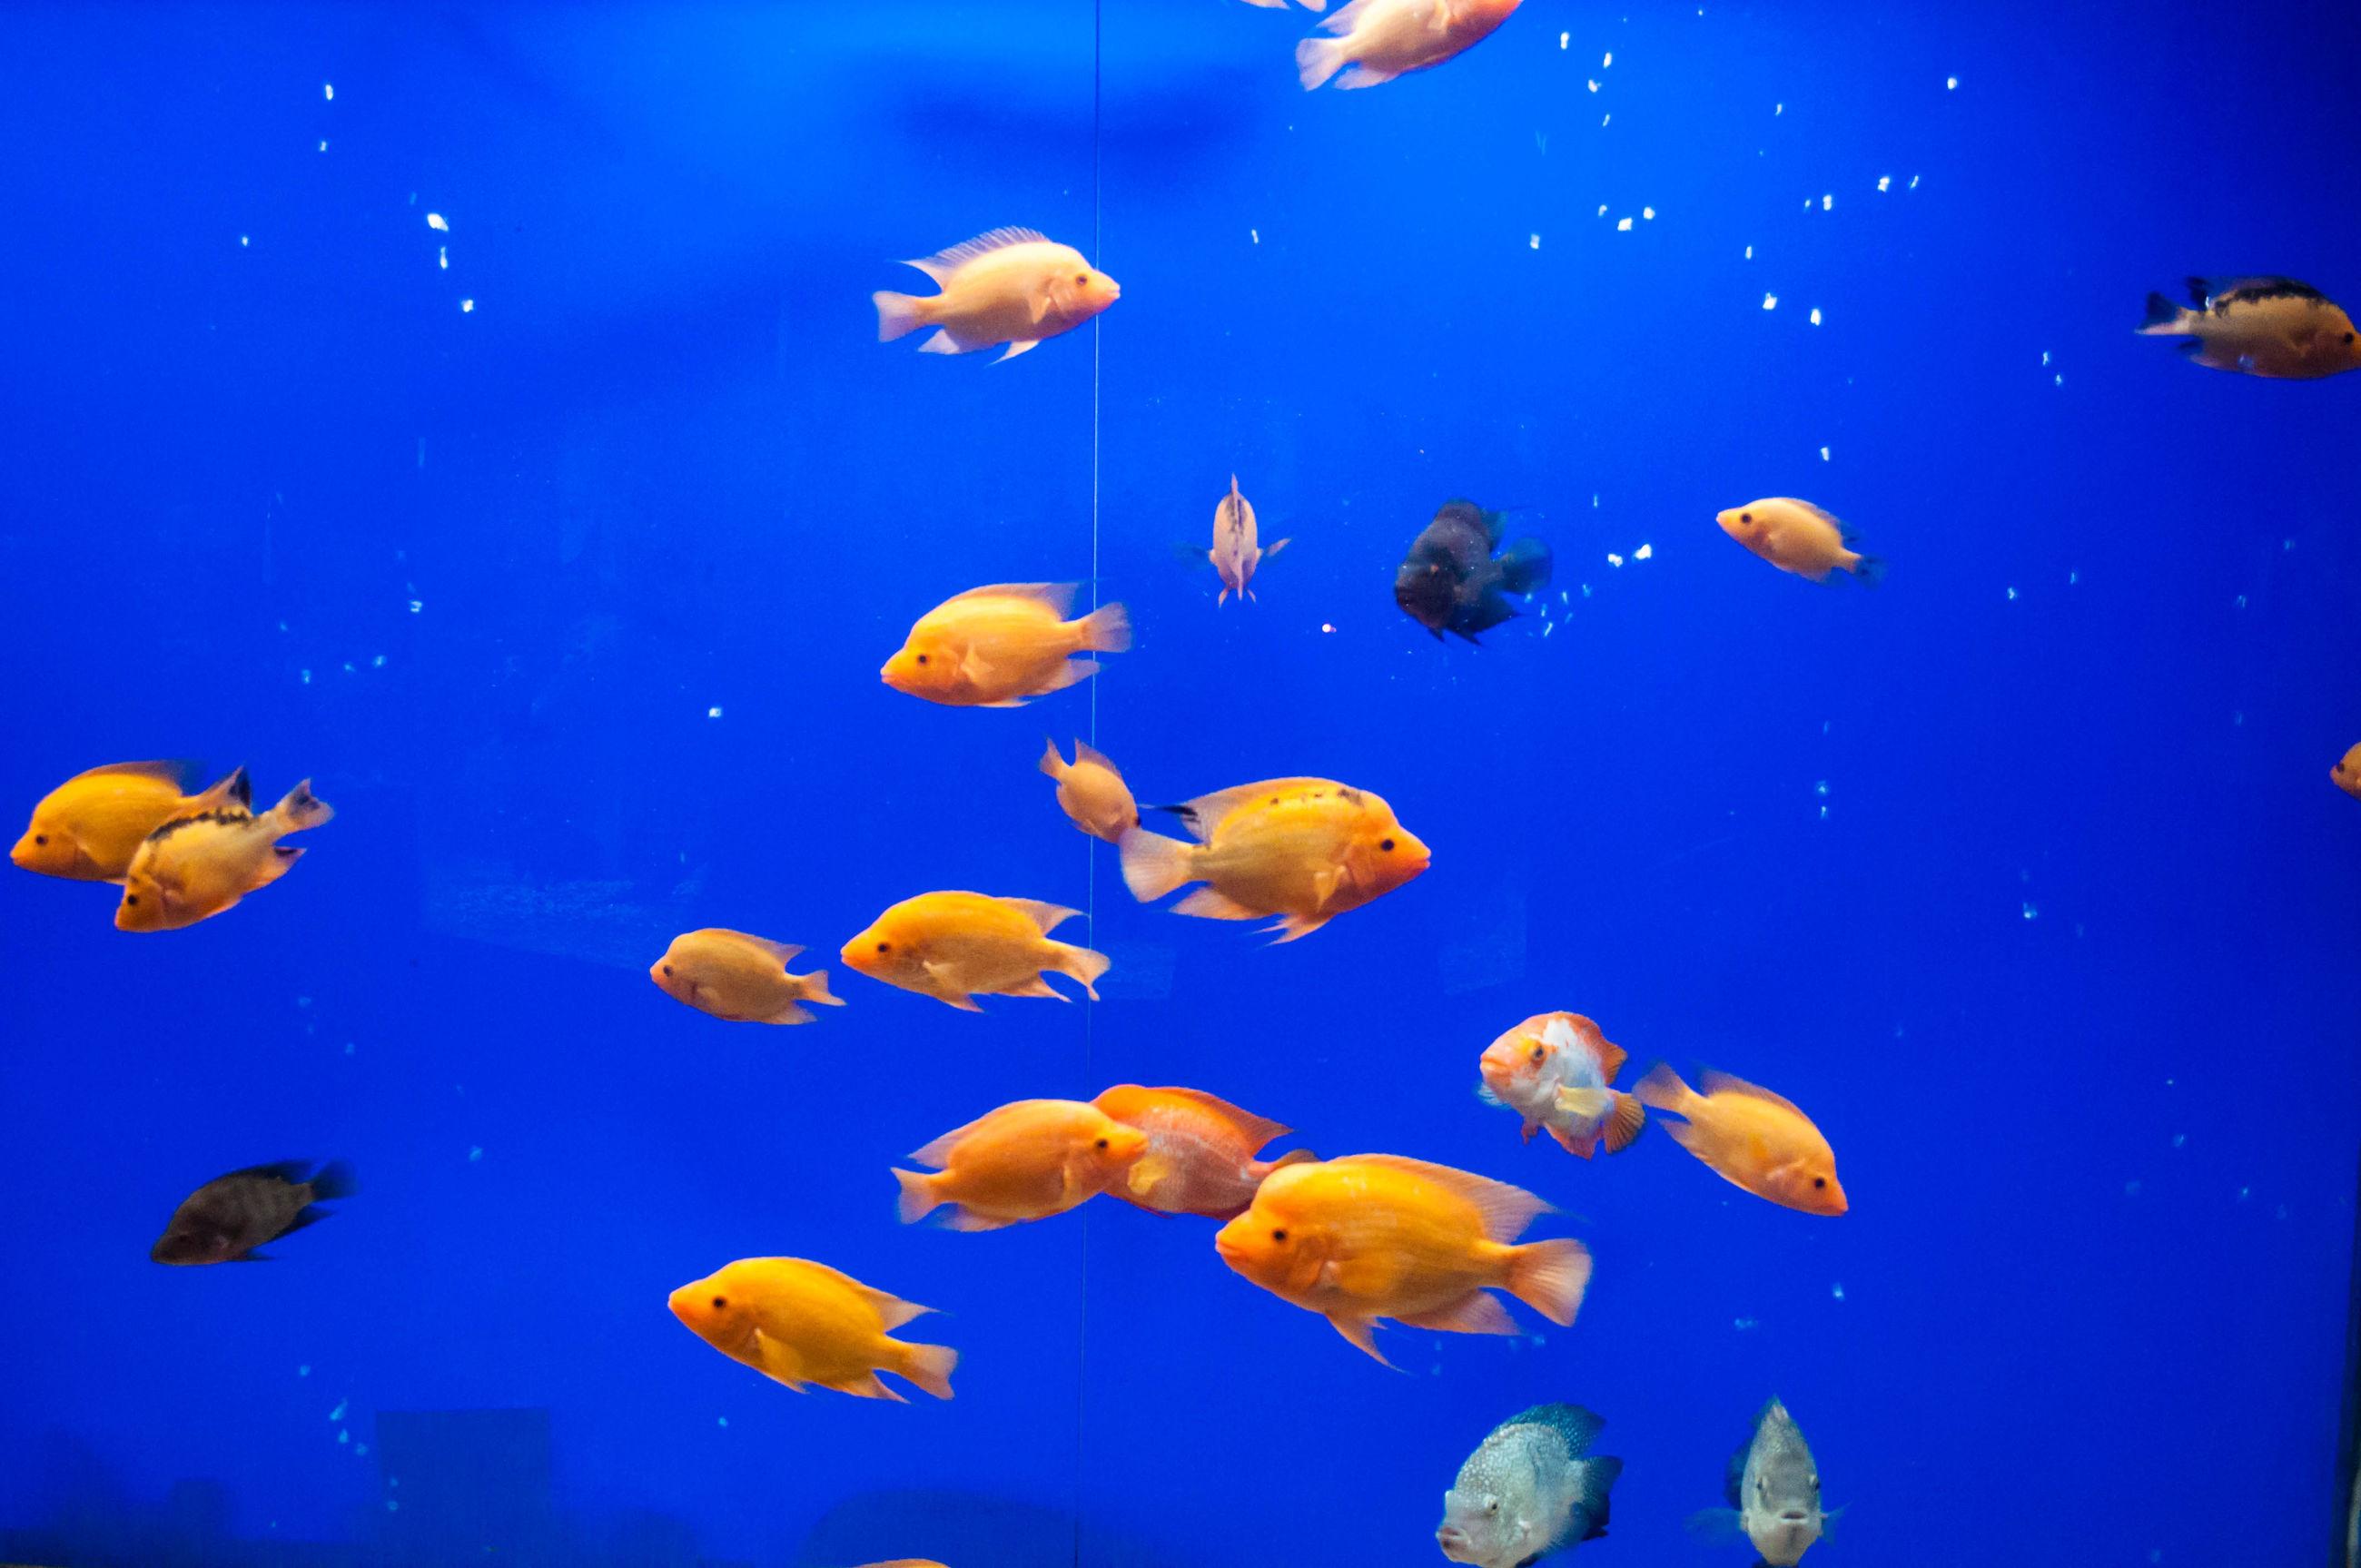 underwater, swimming, sea life, animal themes, water, blue, fish, undersea, wildlife, animals in the wild, sea, nature, beauty in nature, school of fish, yellow, transparent, jellyfish, close-up, aquarium